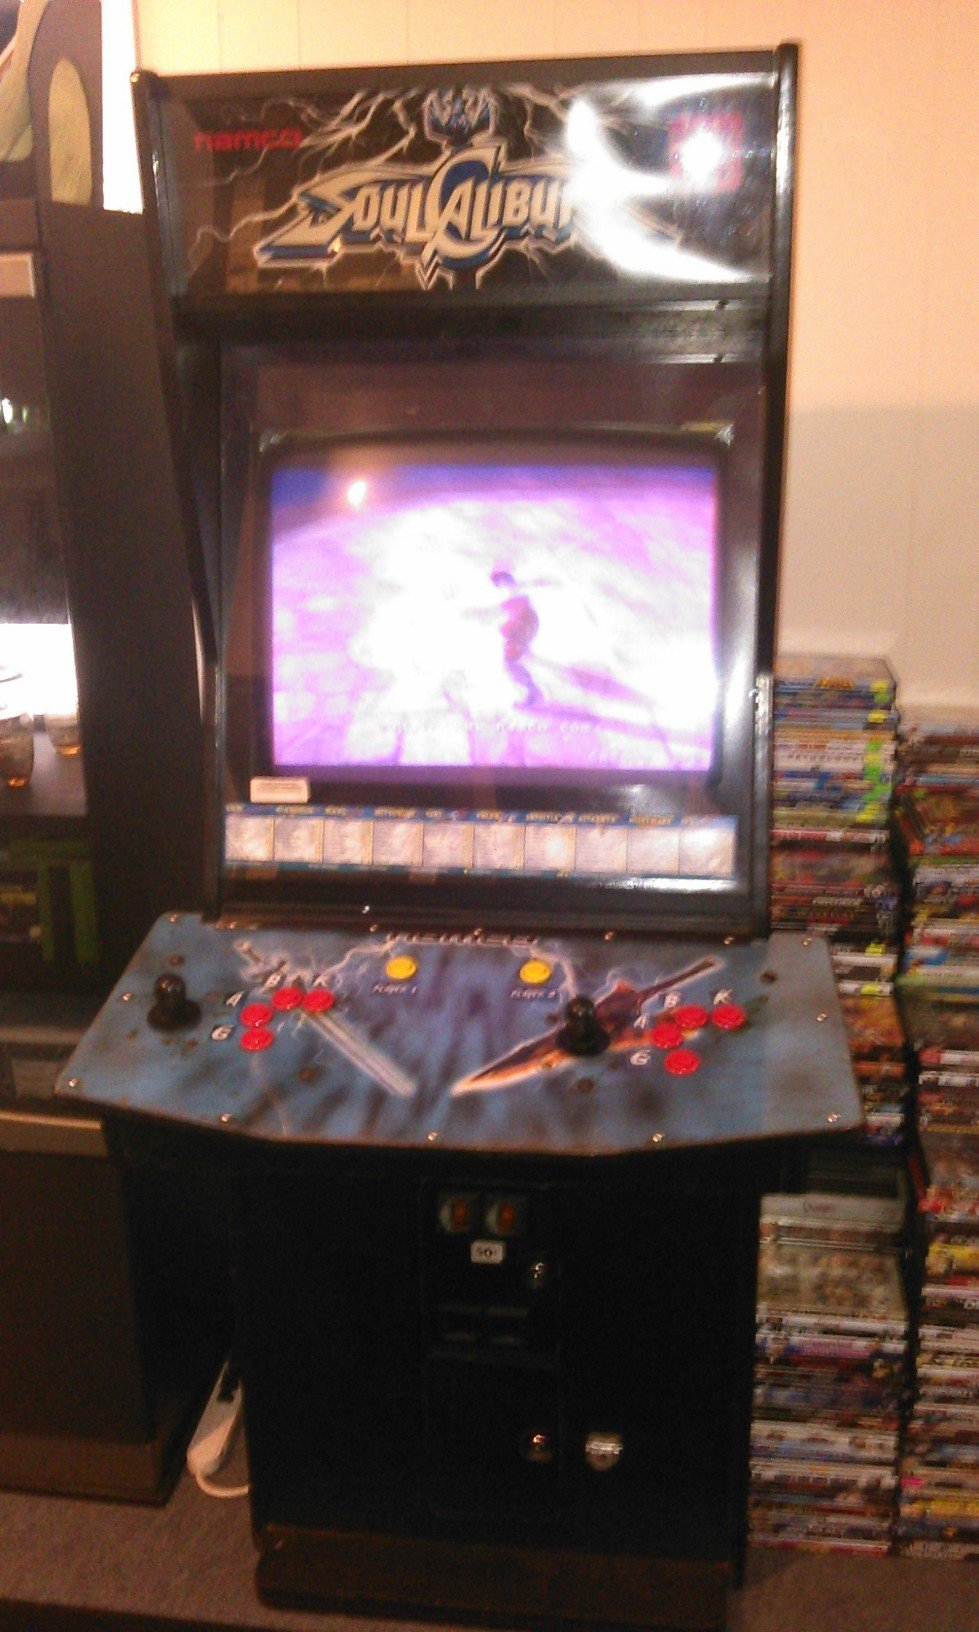 Original Soul Calibur Video Arcade Game For Sale In